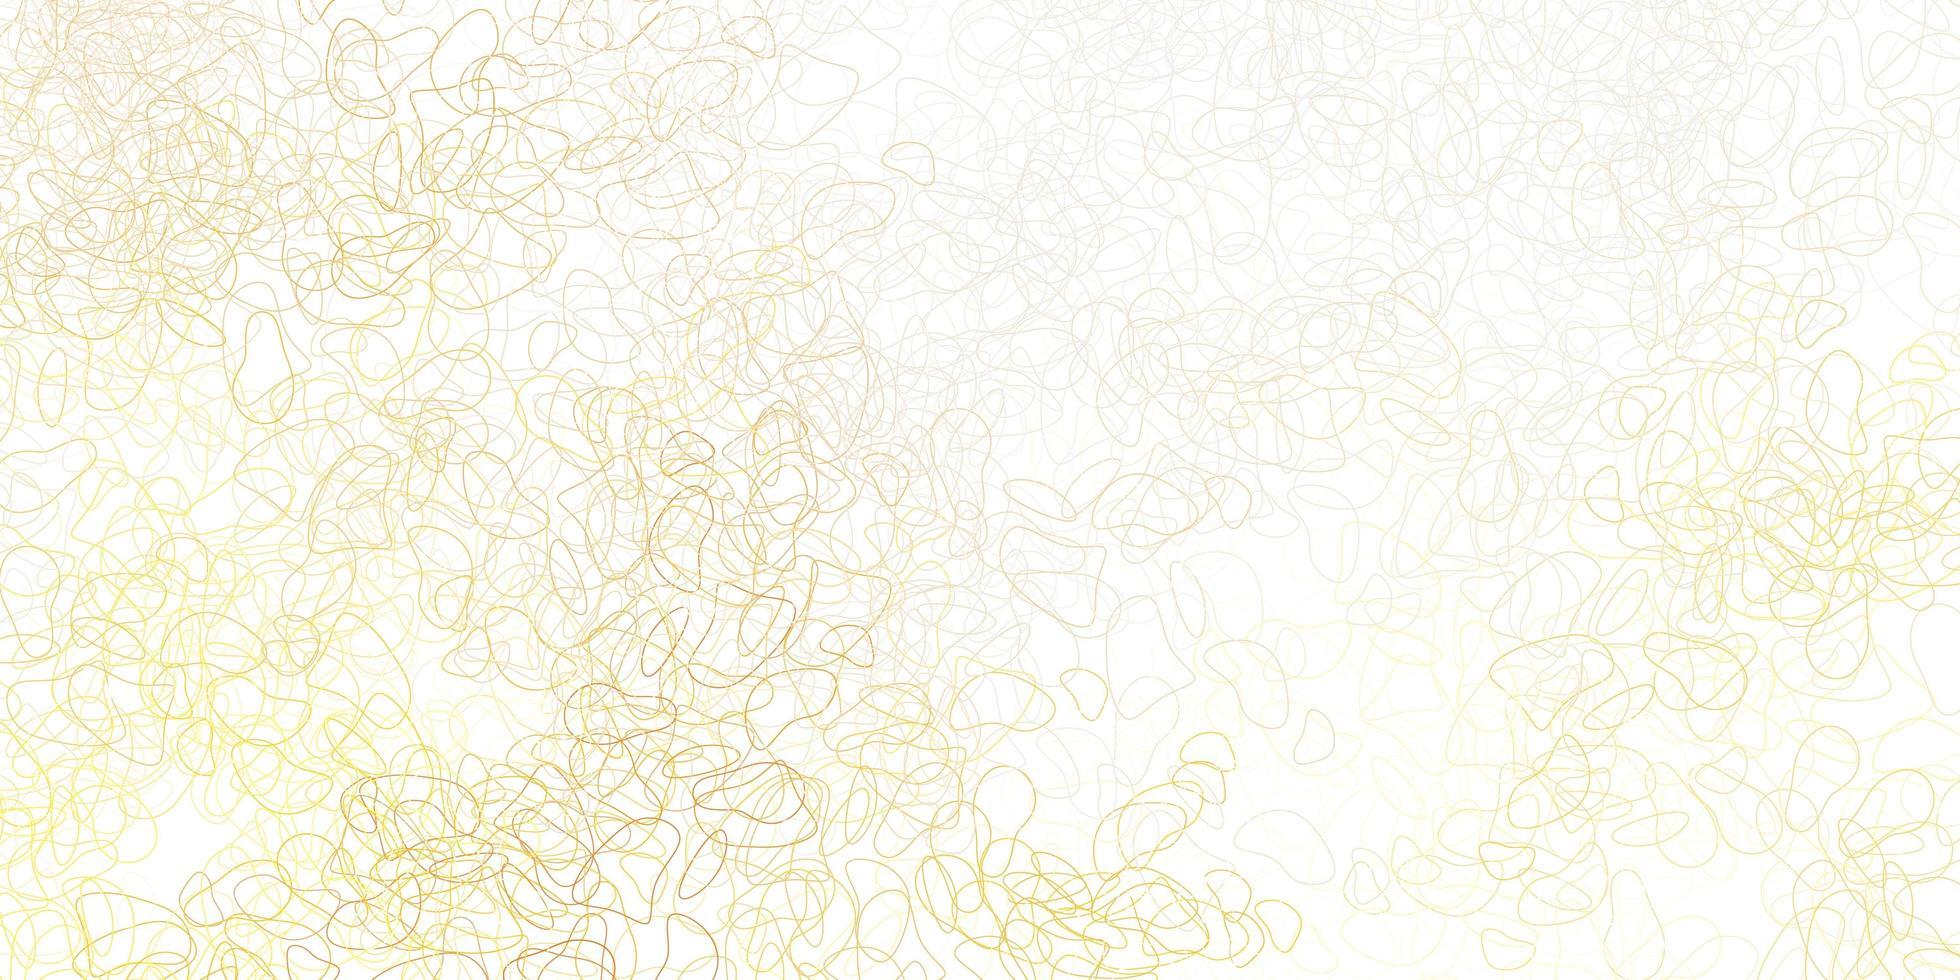 modelo laranja claro com formas abstratas. vetor